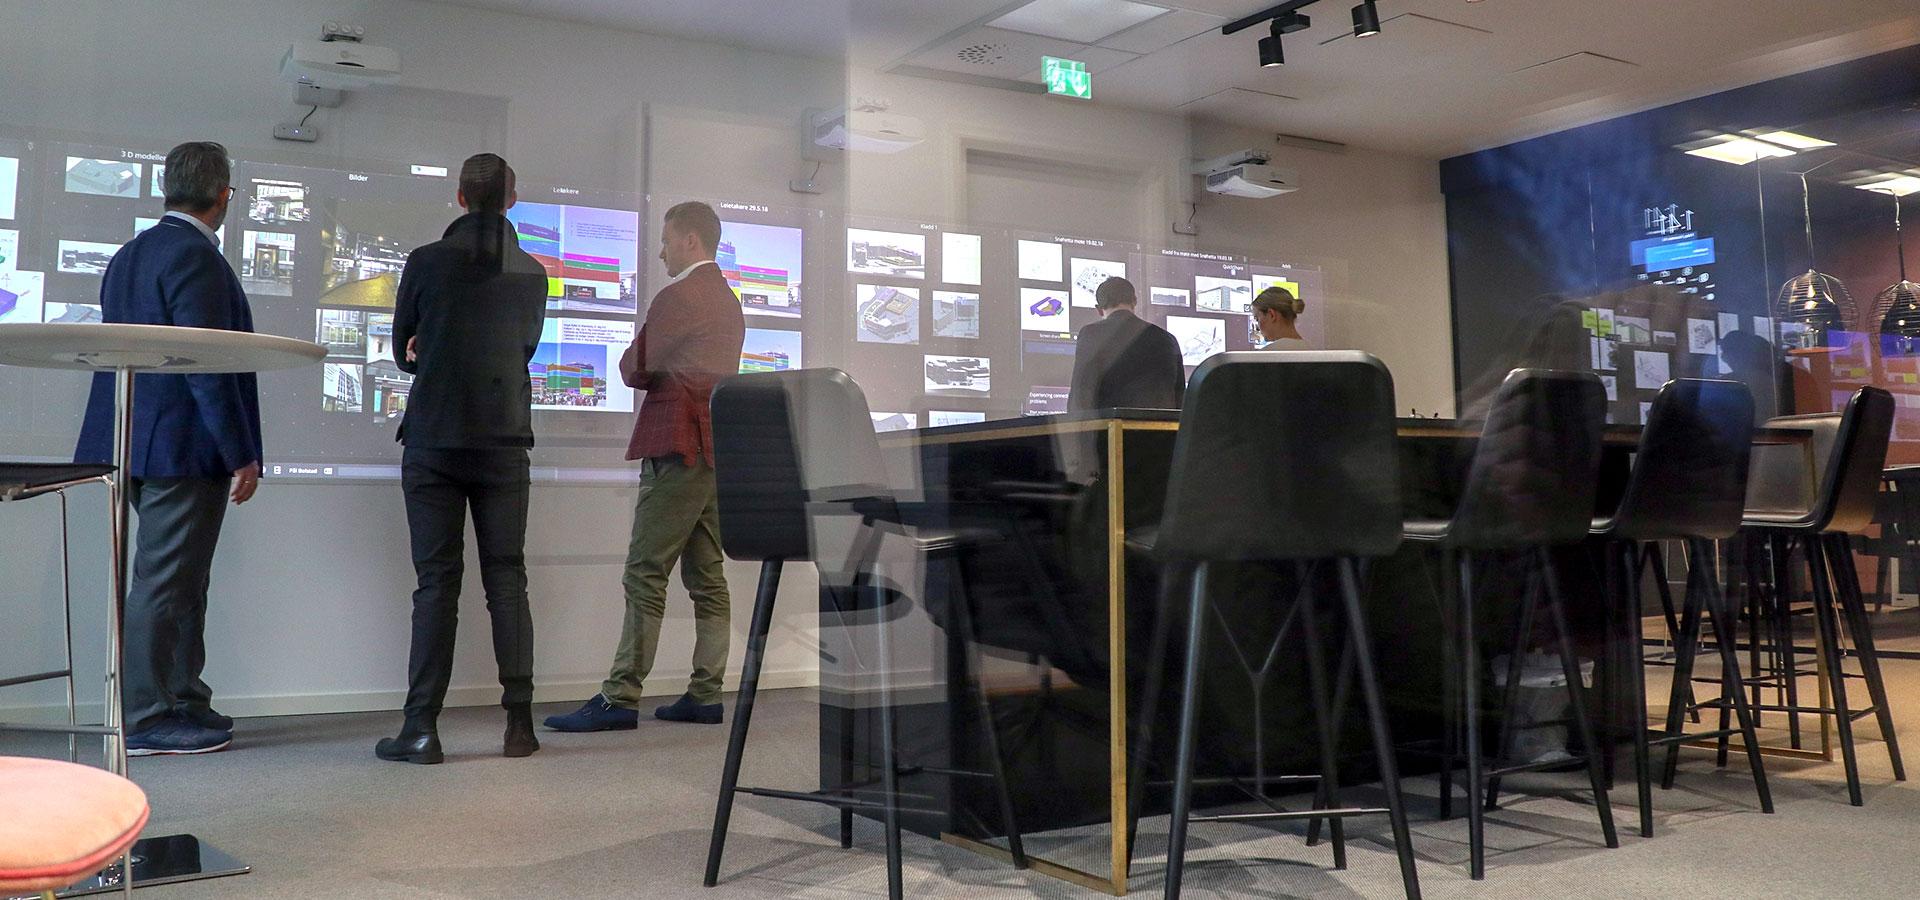 Interaktivt-Moterom-Nureva-Interaktive-skjermer-vegg